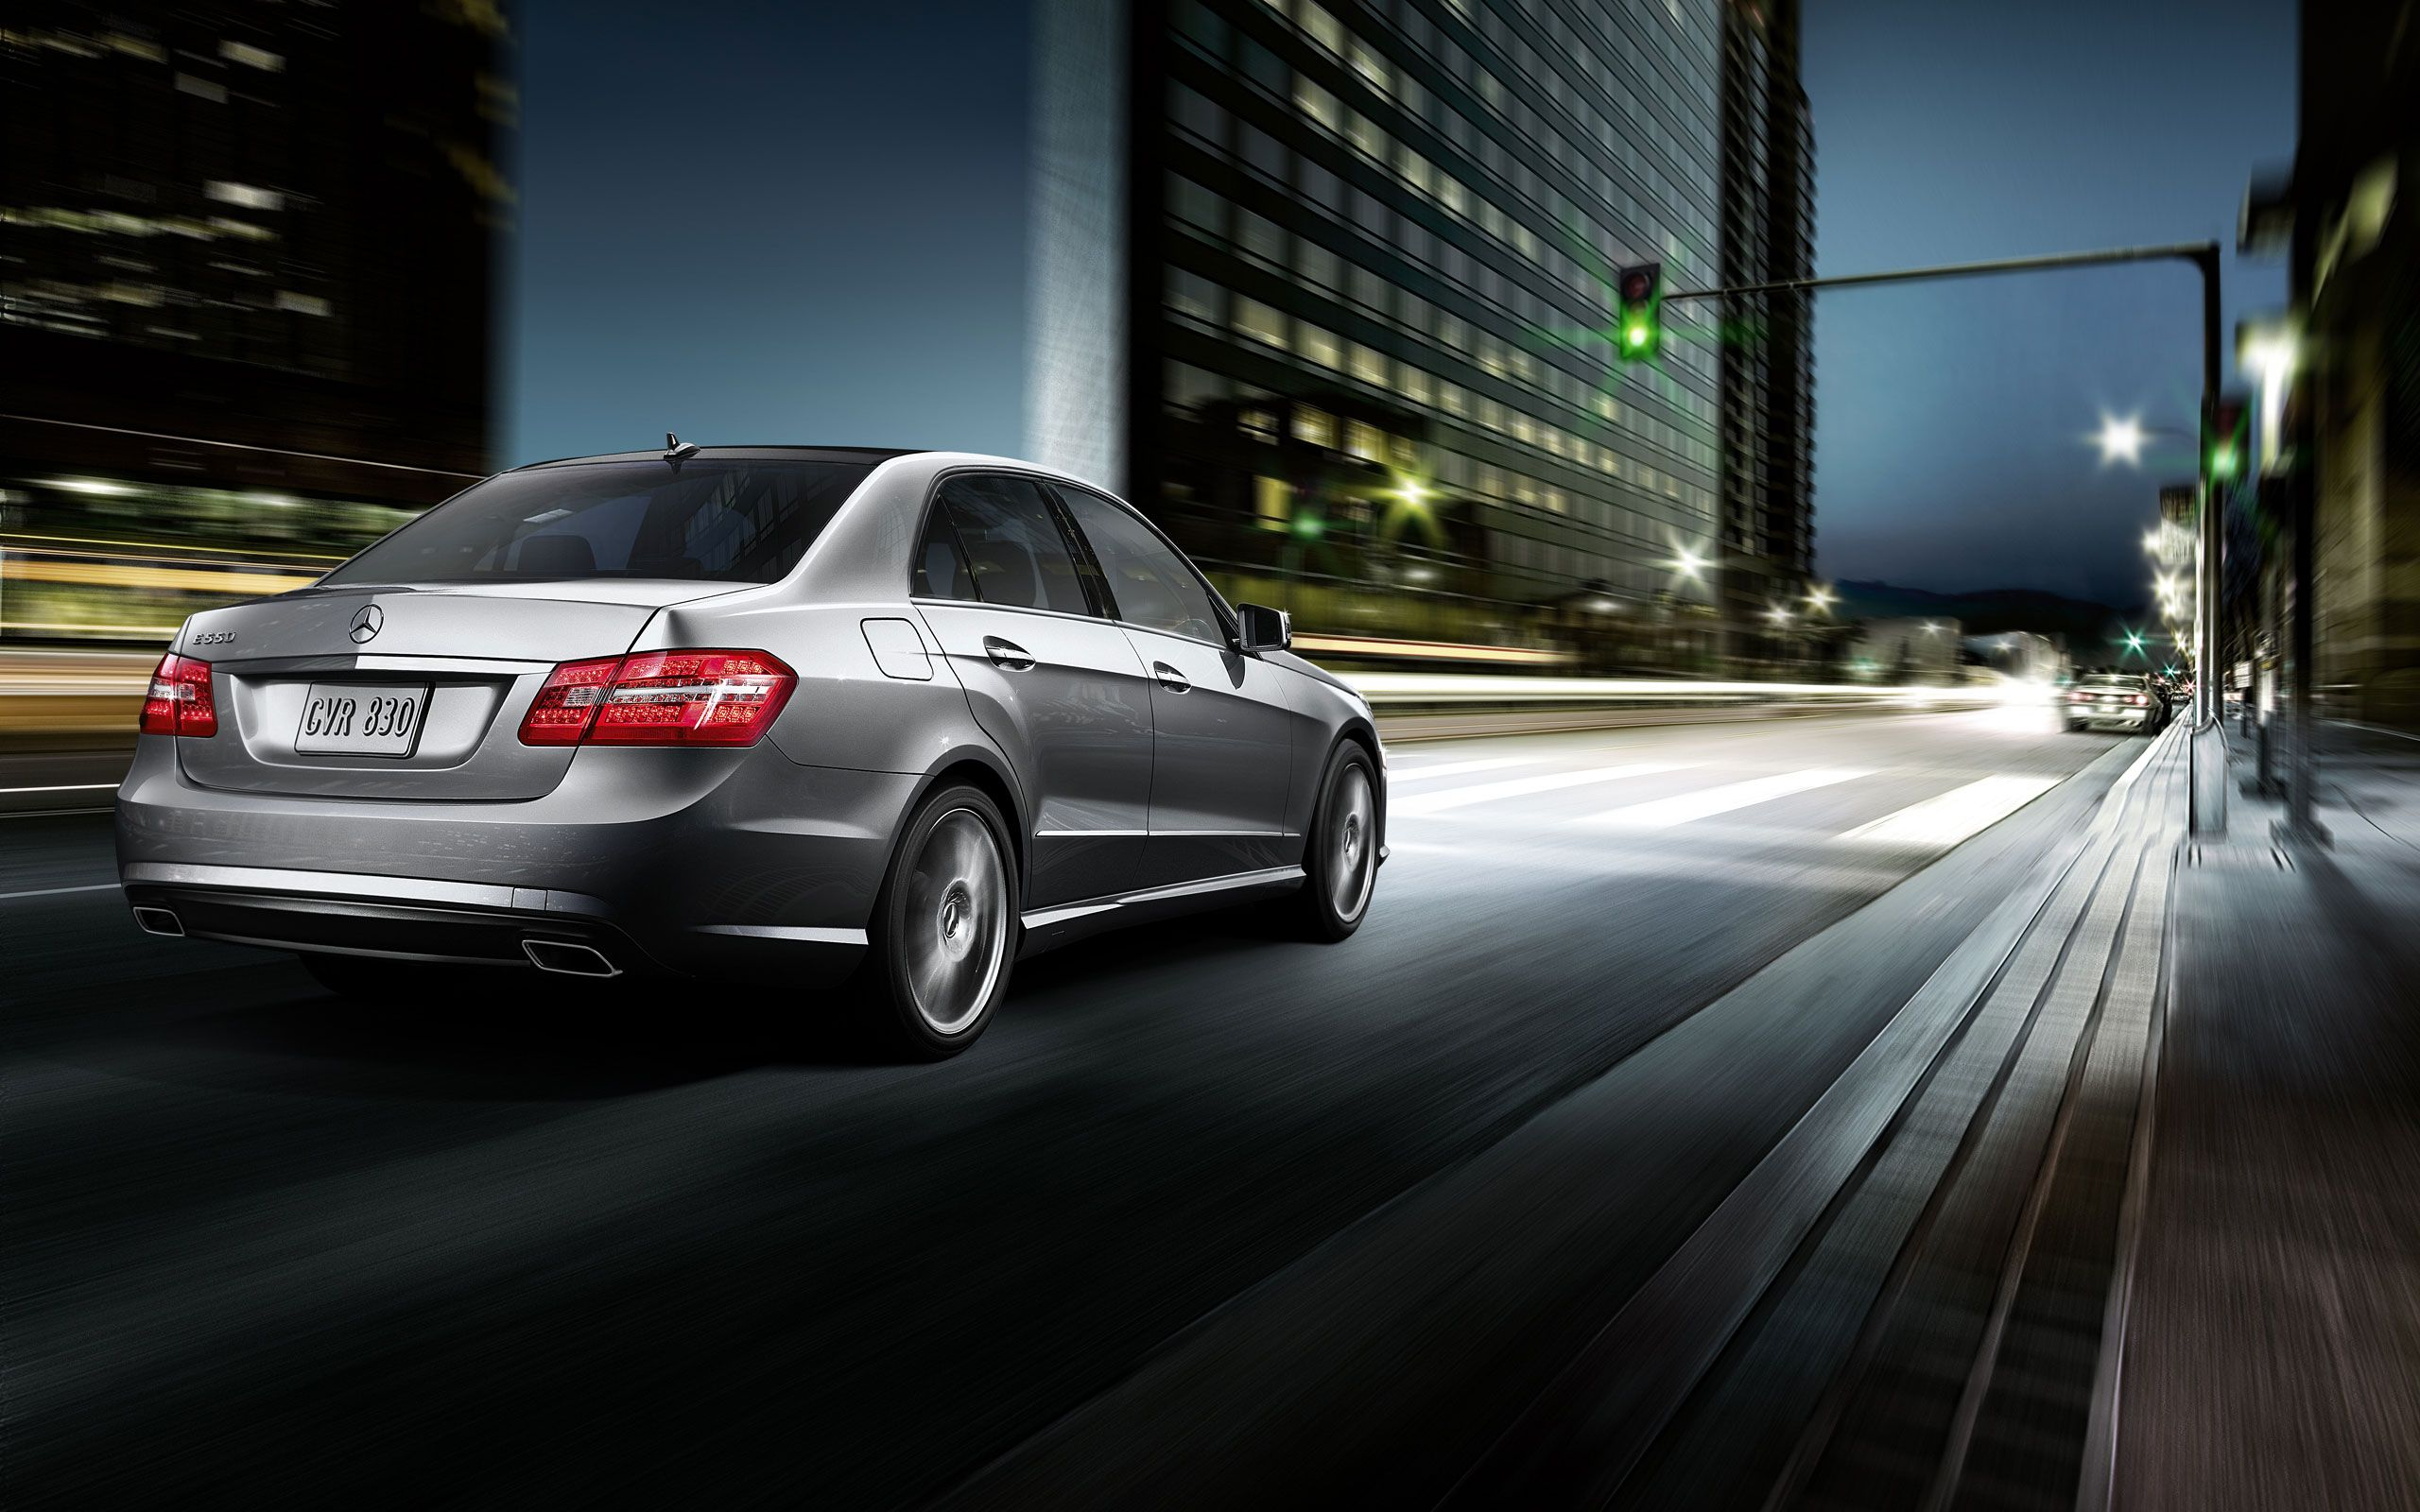 Mercedes e550 amg mercedes benz e class pinterest for Mercedes benz e550 amg